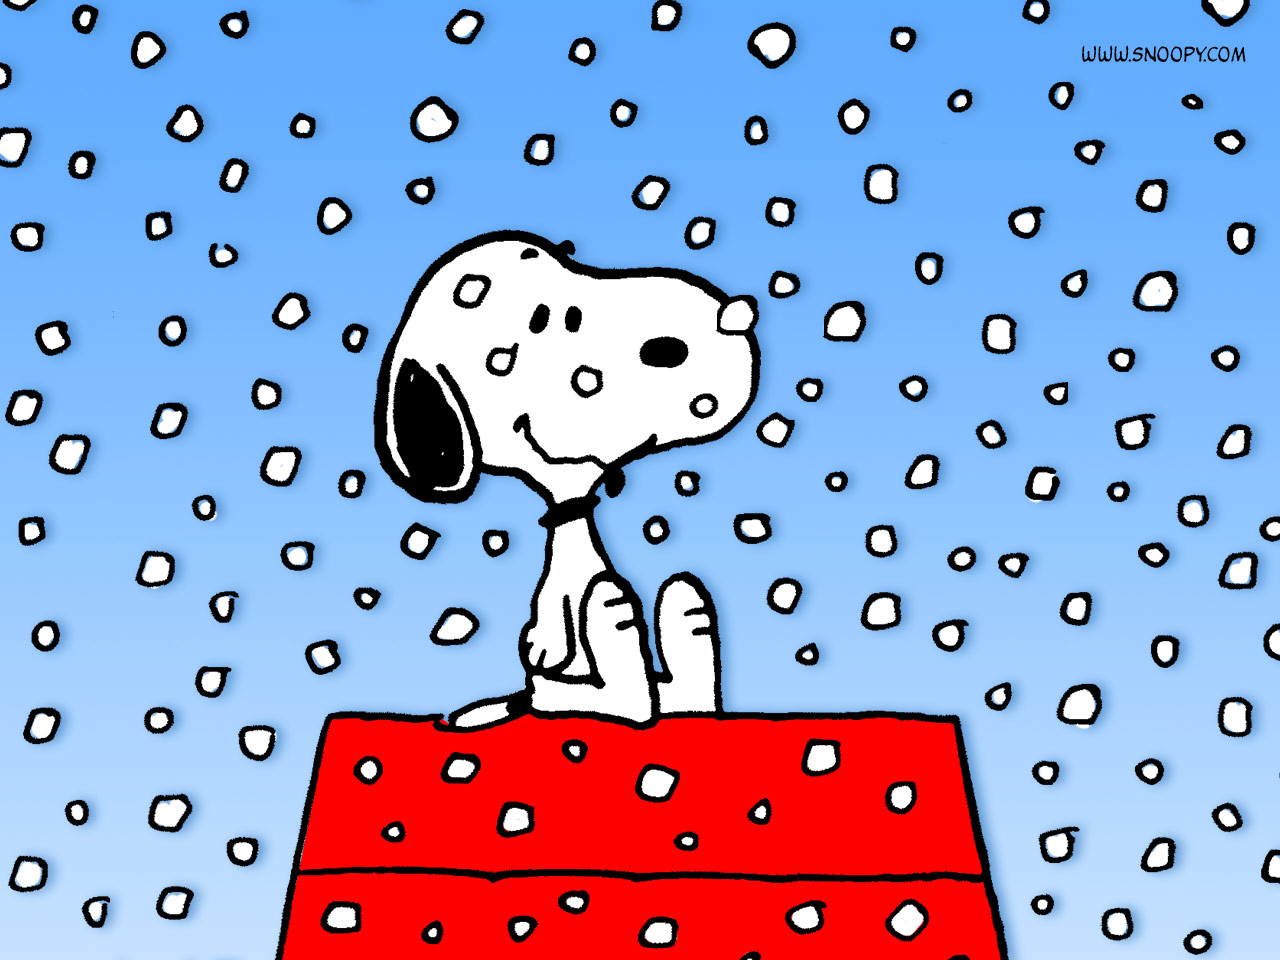 snoopy winter wallpaper   get domain pictures   getdomainvidscom 1280x960